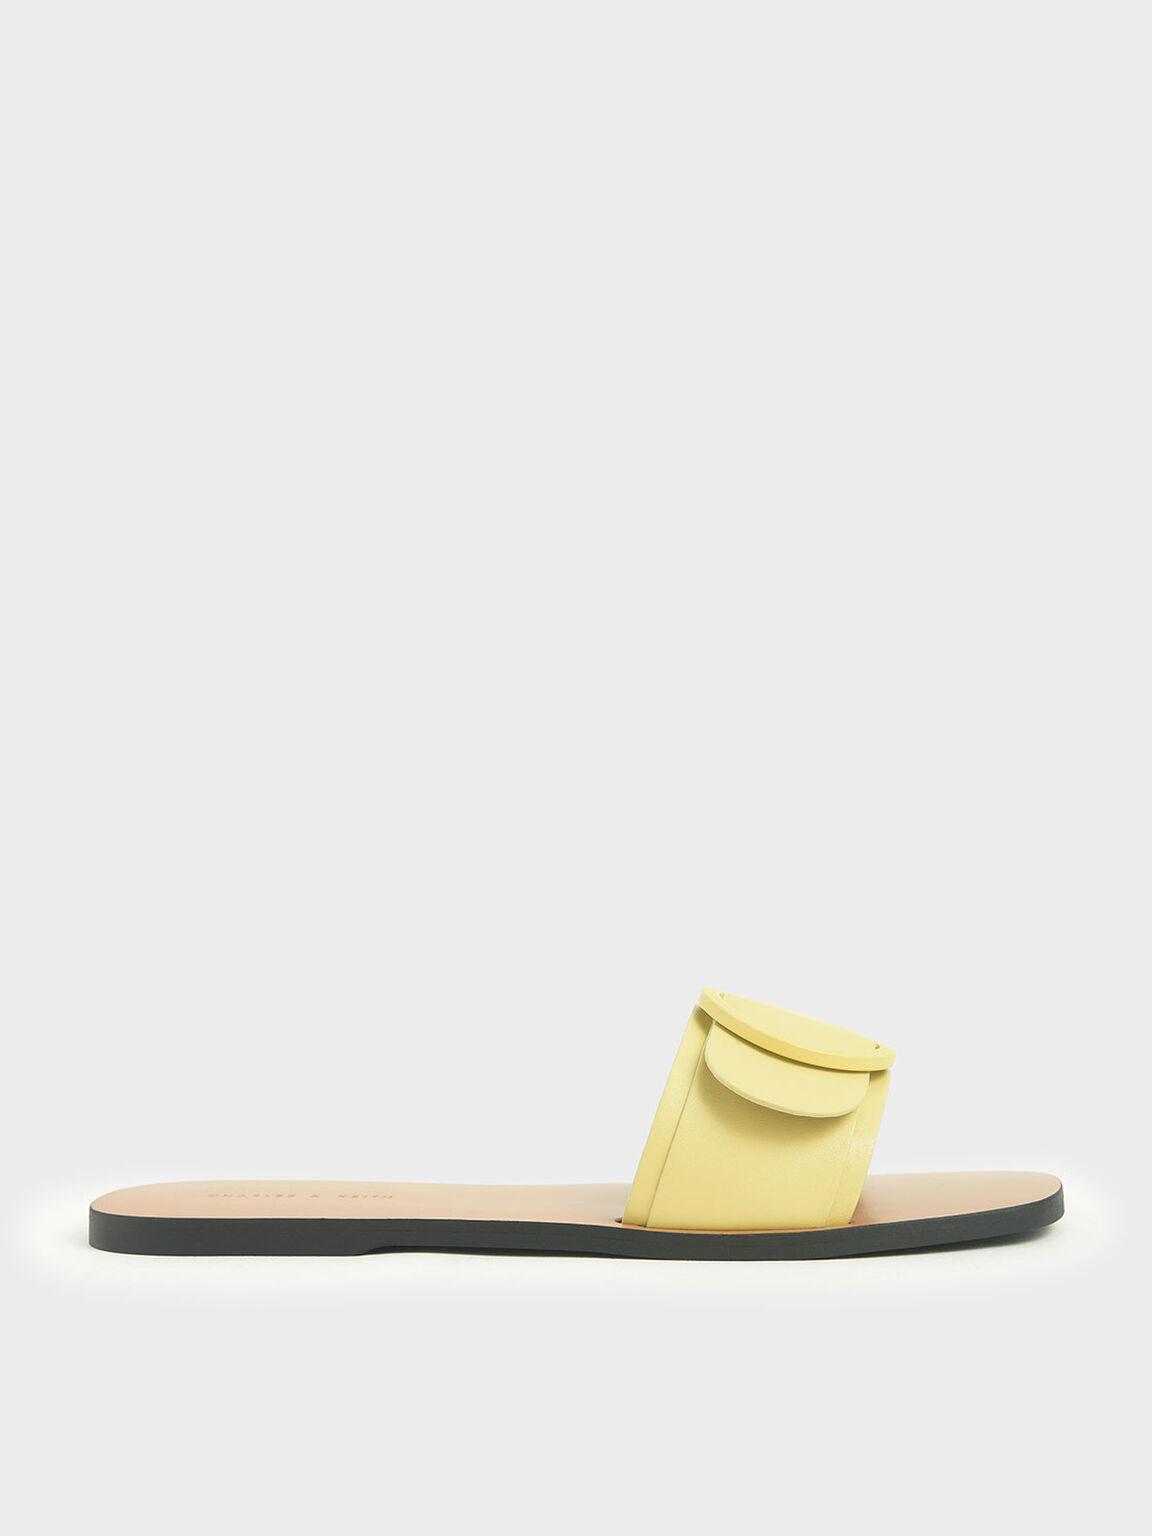 Buckle Strap Slide Sandals, Yellow, hi-res